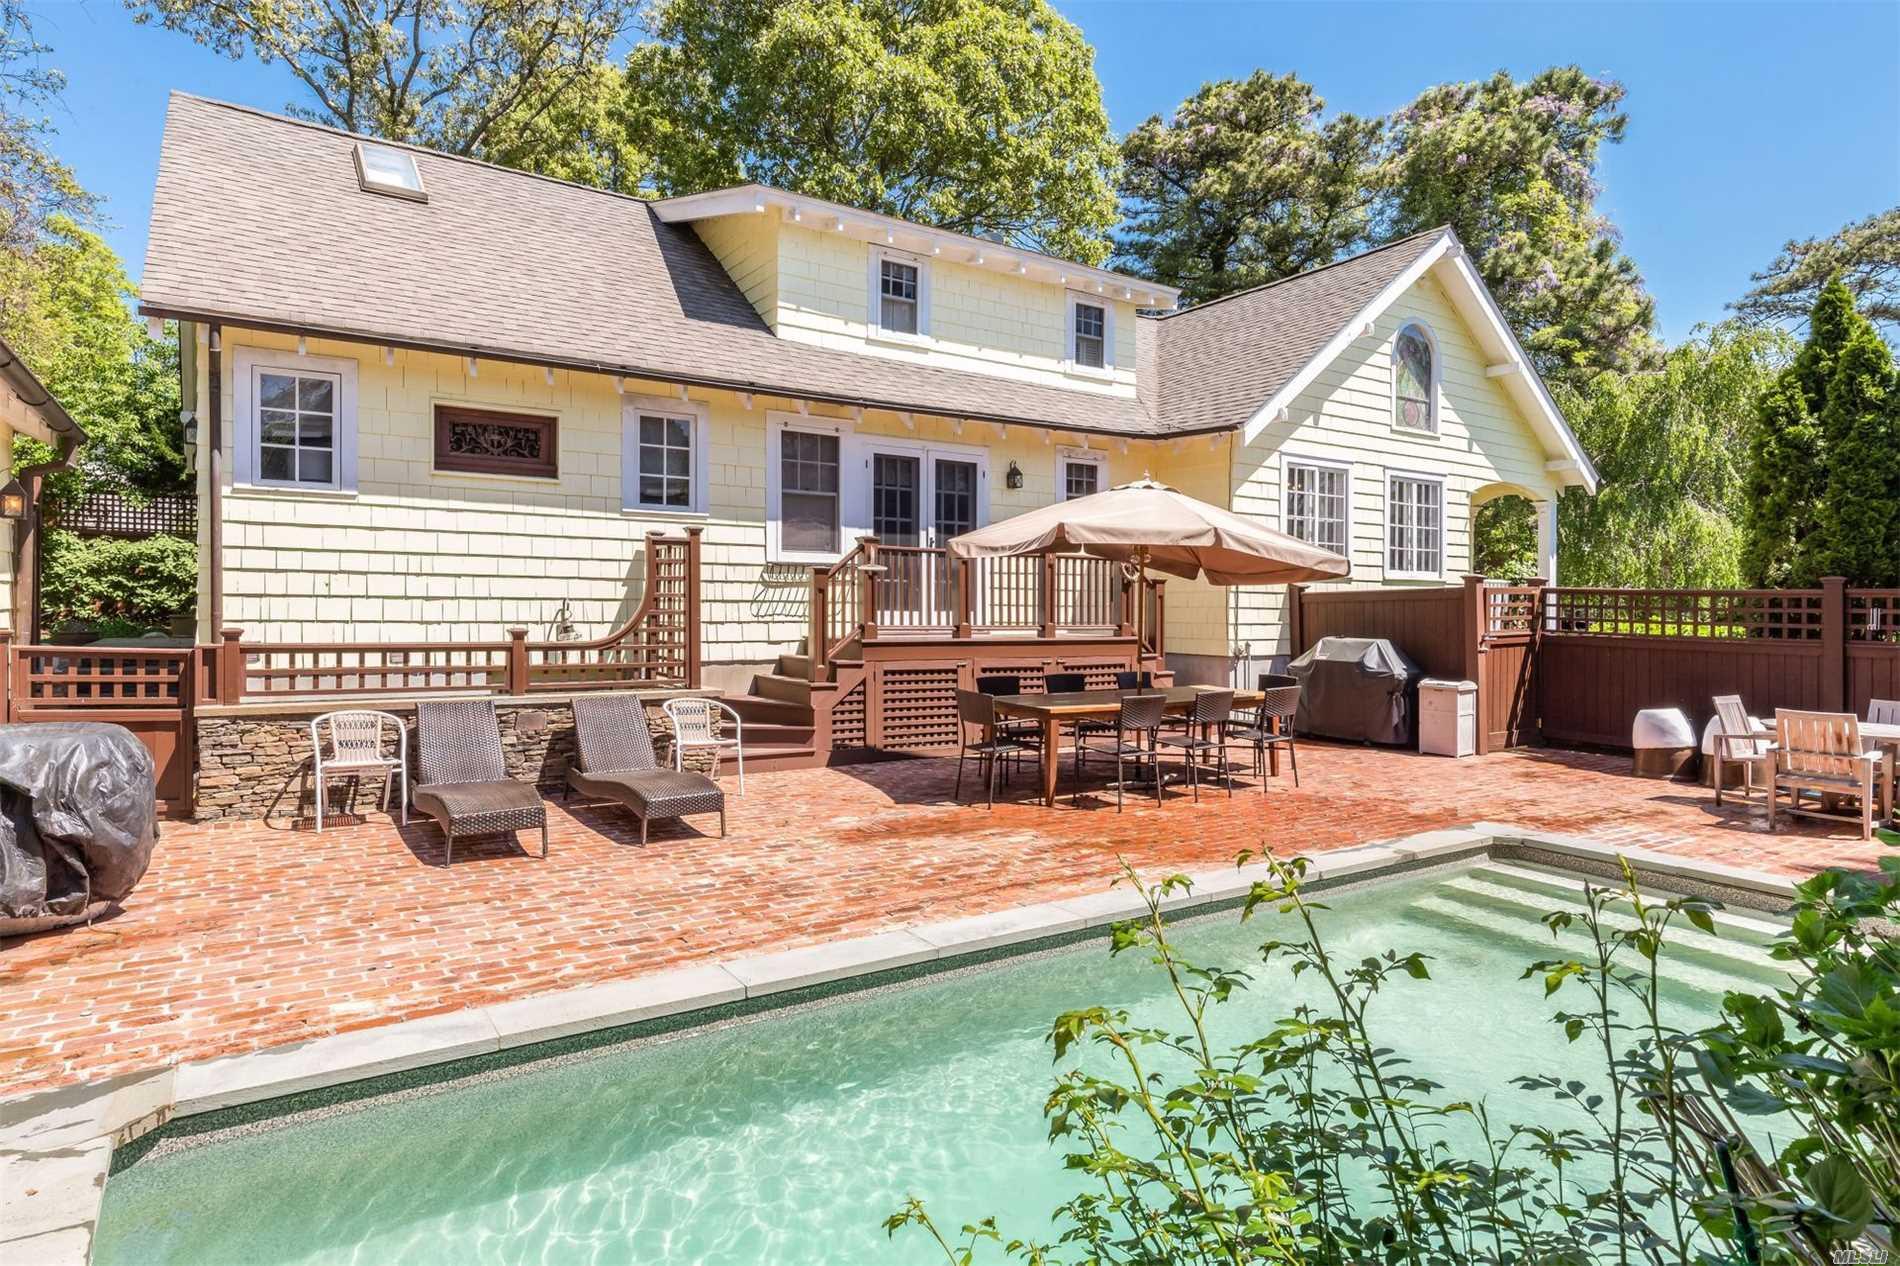 Photo of home for sale at 7 Shinnecock Pl, Hampton Bays NY